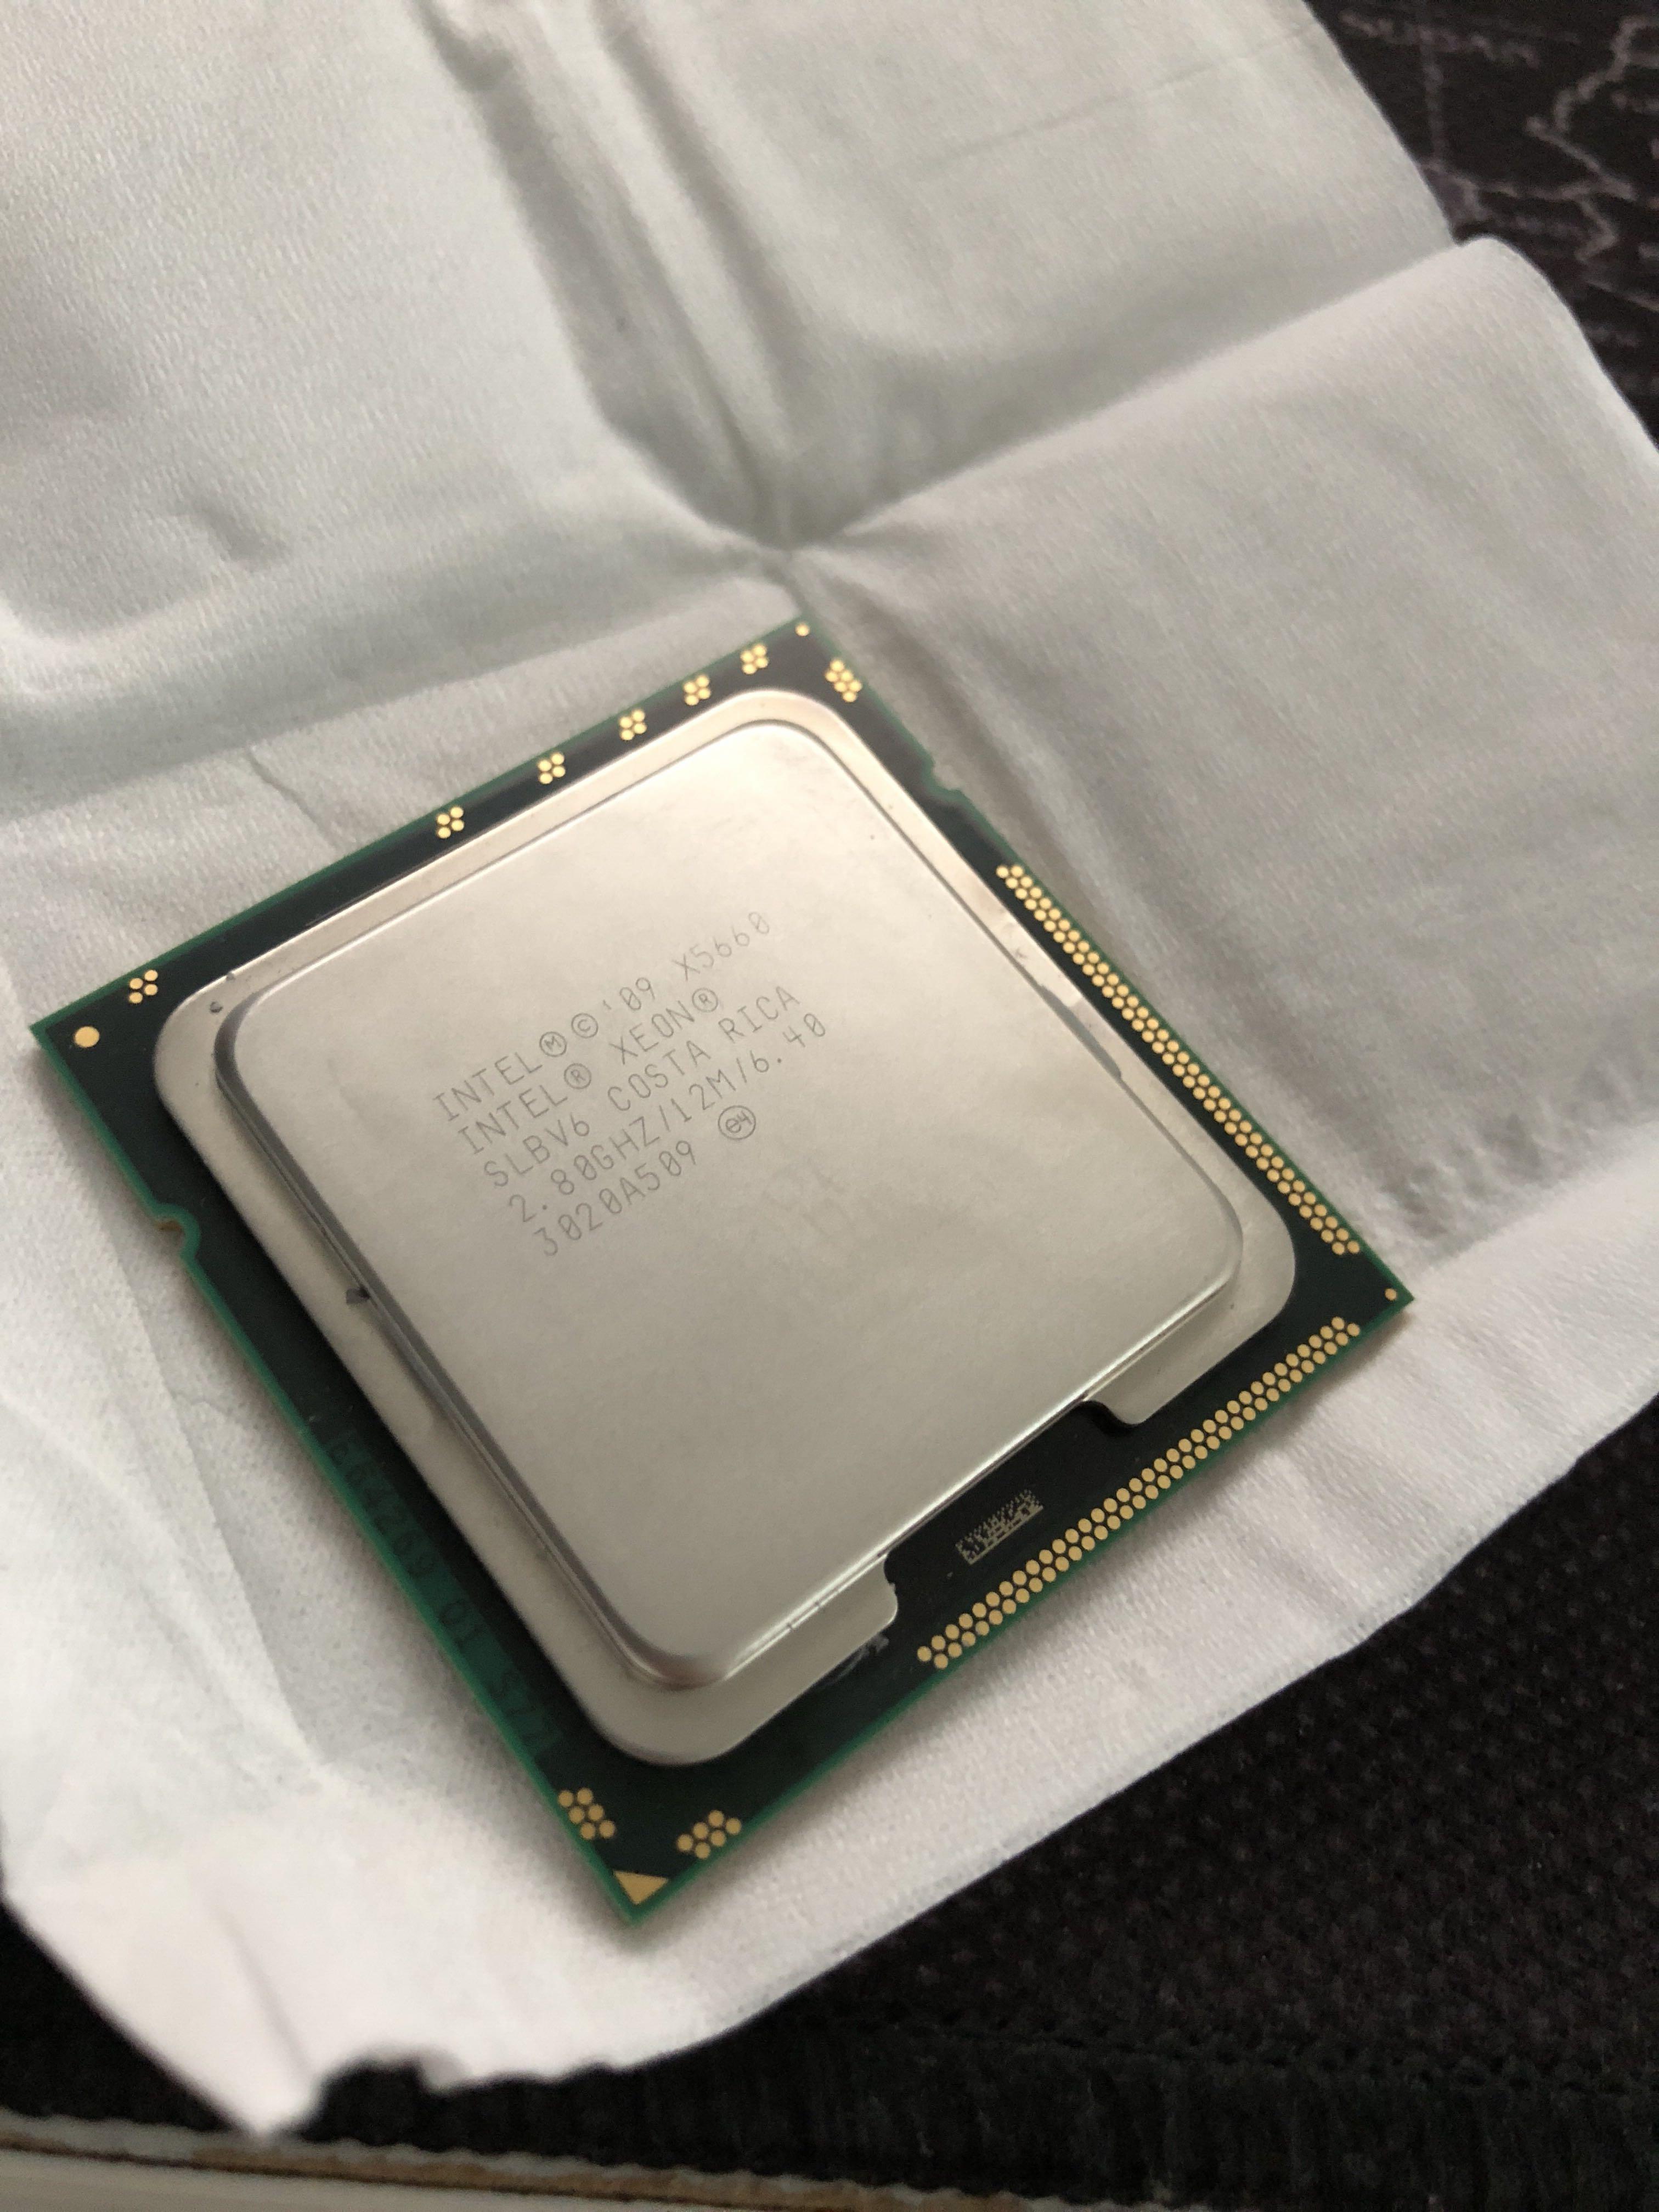 Intel® Xeon® Processor X5660